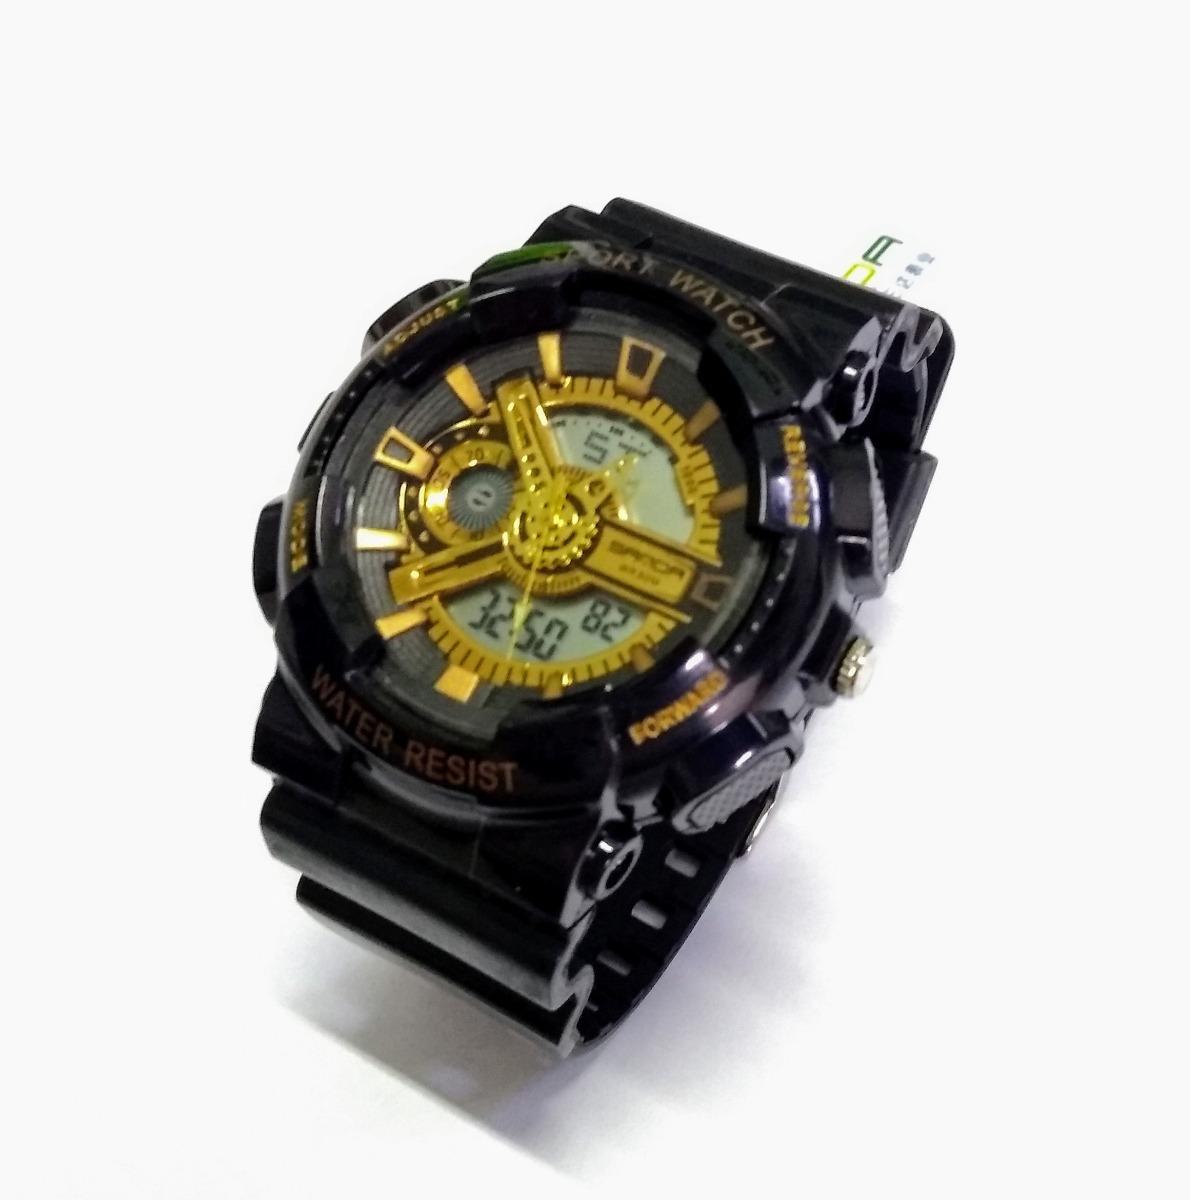 6348300b3b1 relógio masculinos esportivo luxo. Carregando zoom.